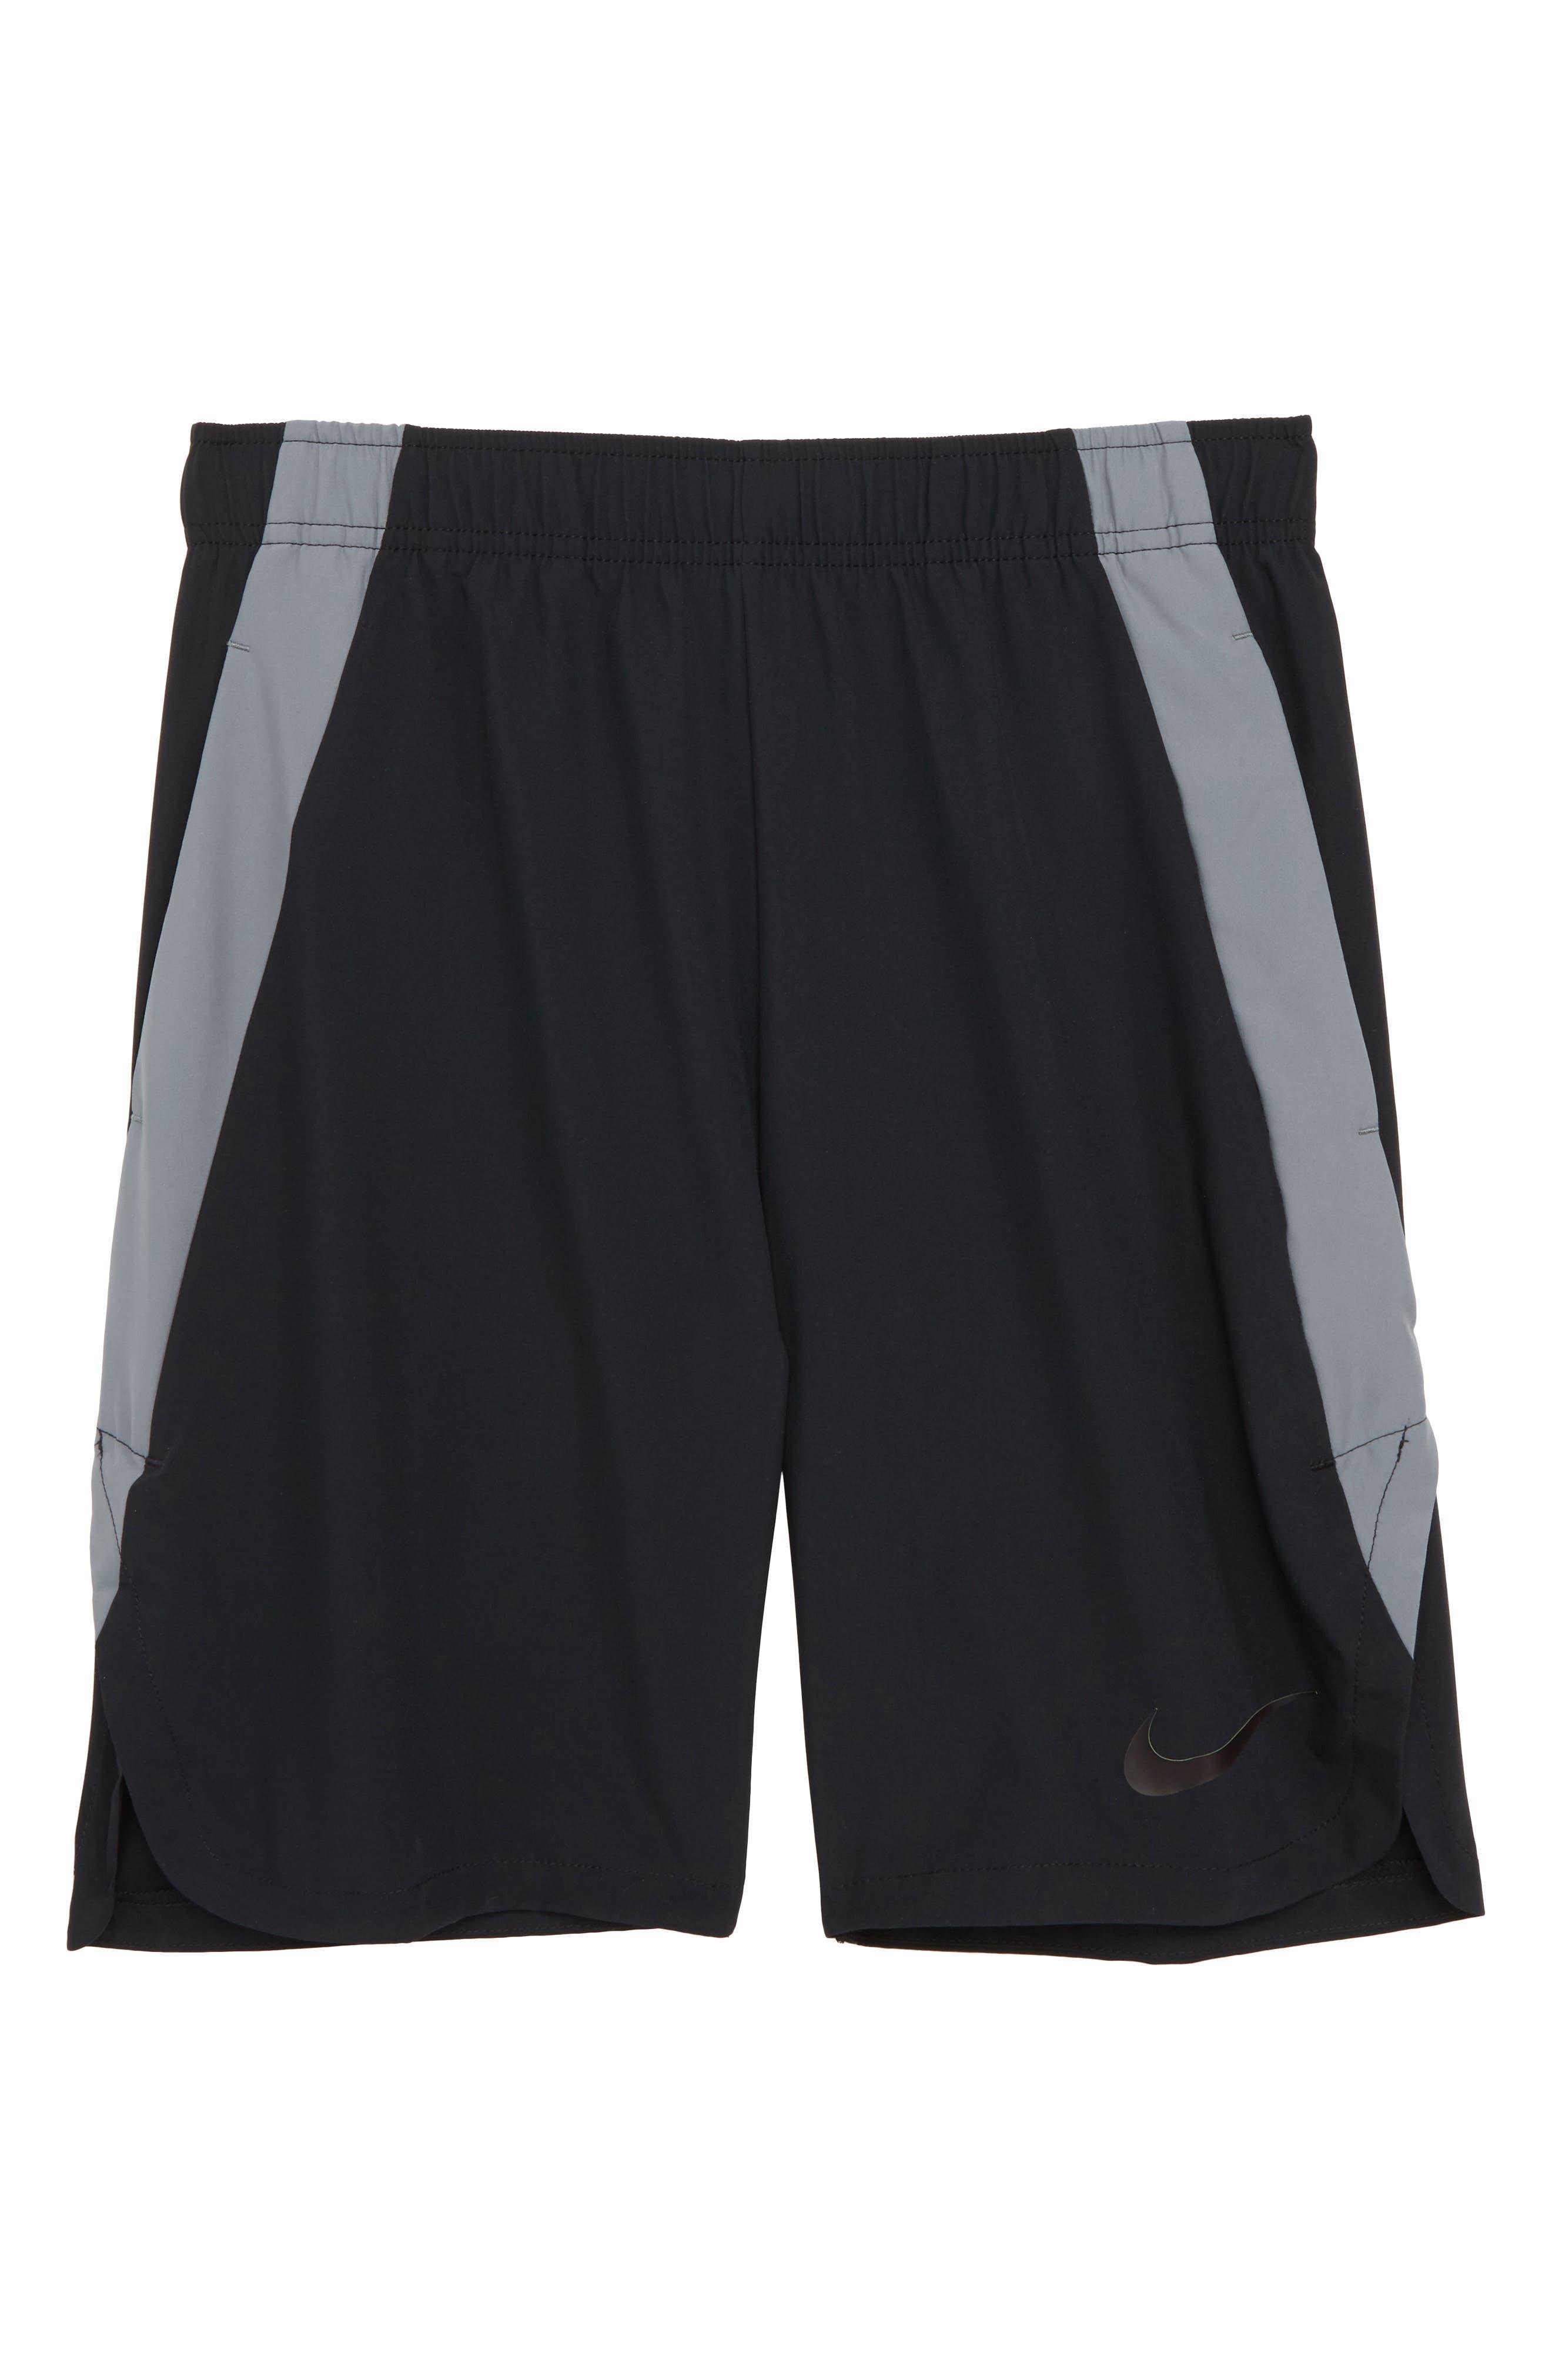 Dry Training Shorts,                         Main,                         color, BLACK/ COOL GREY